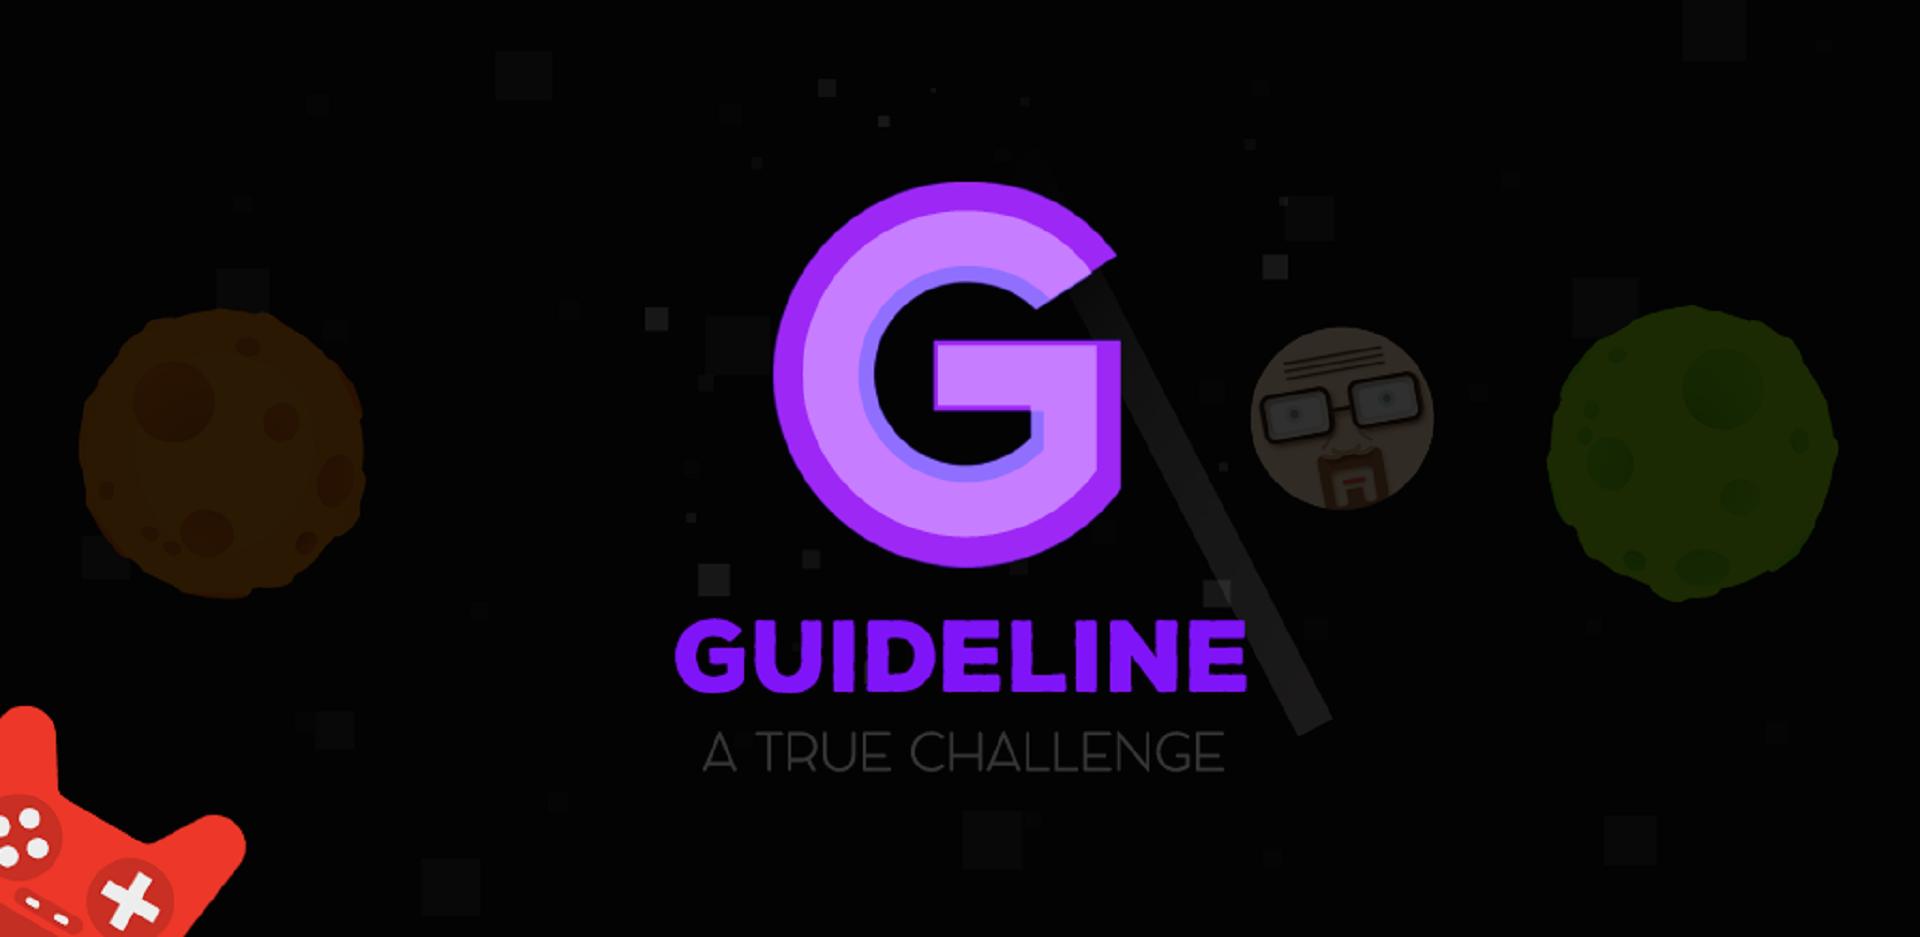 Guideline: Impossiball